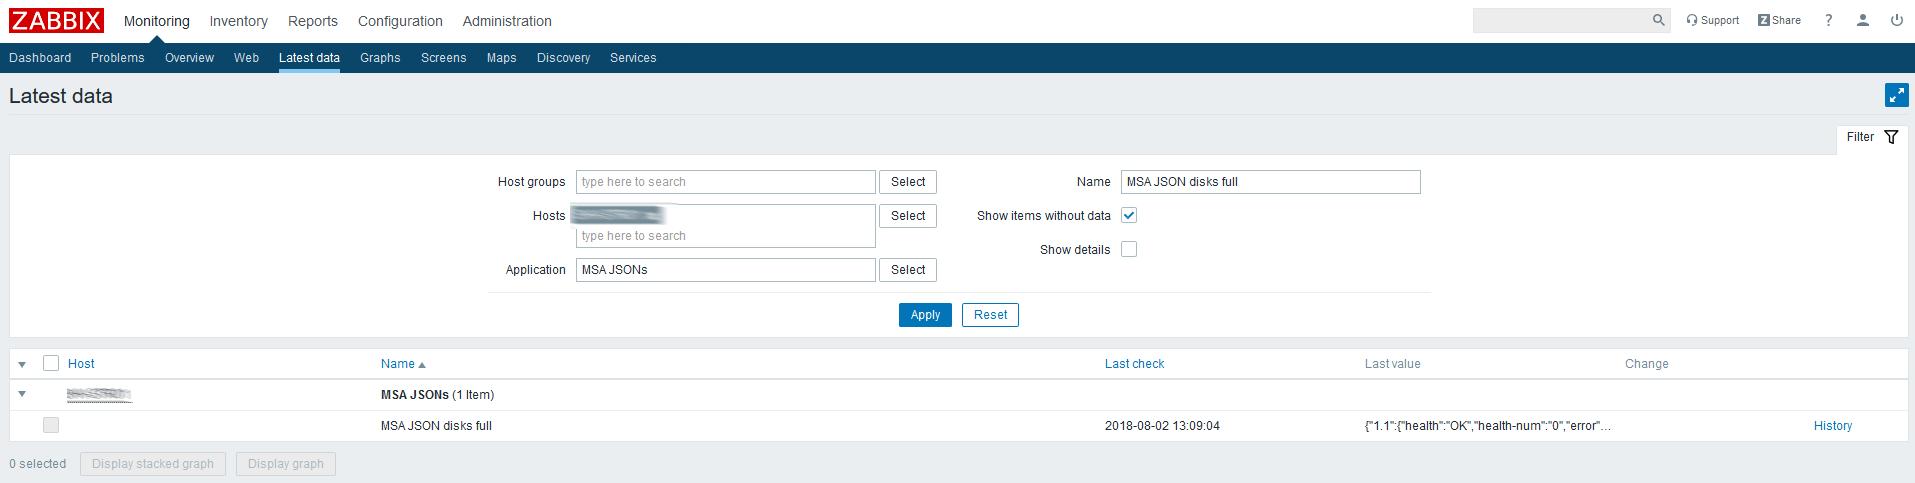 Использование Dependent items в Zabbix 4.0 на примере HPE MSA 2040-2050 - 3